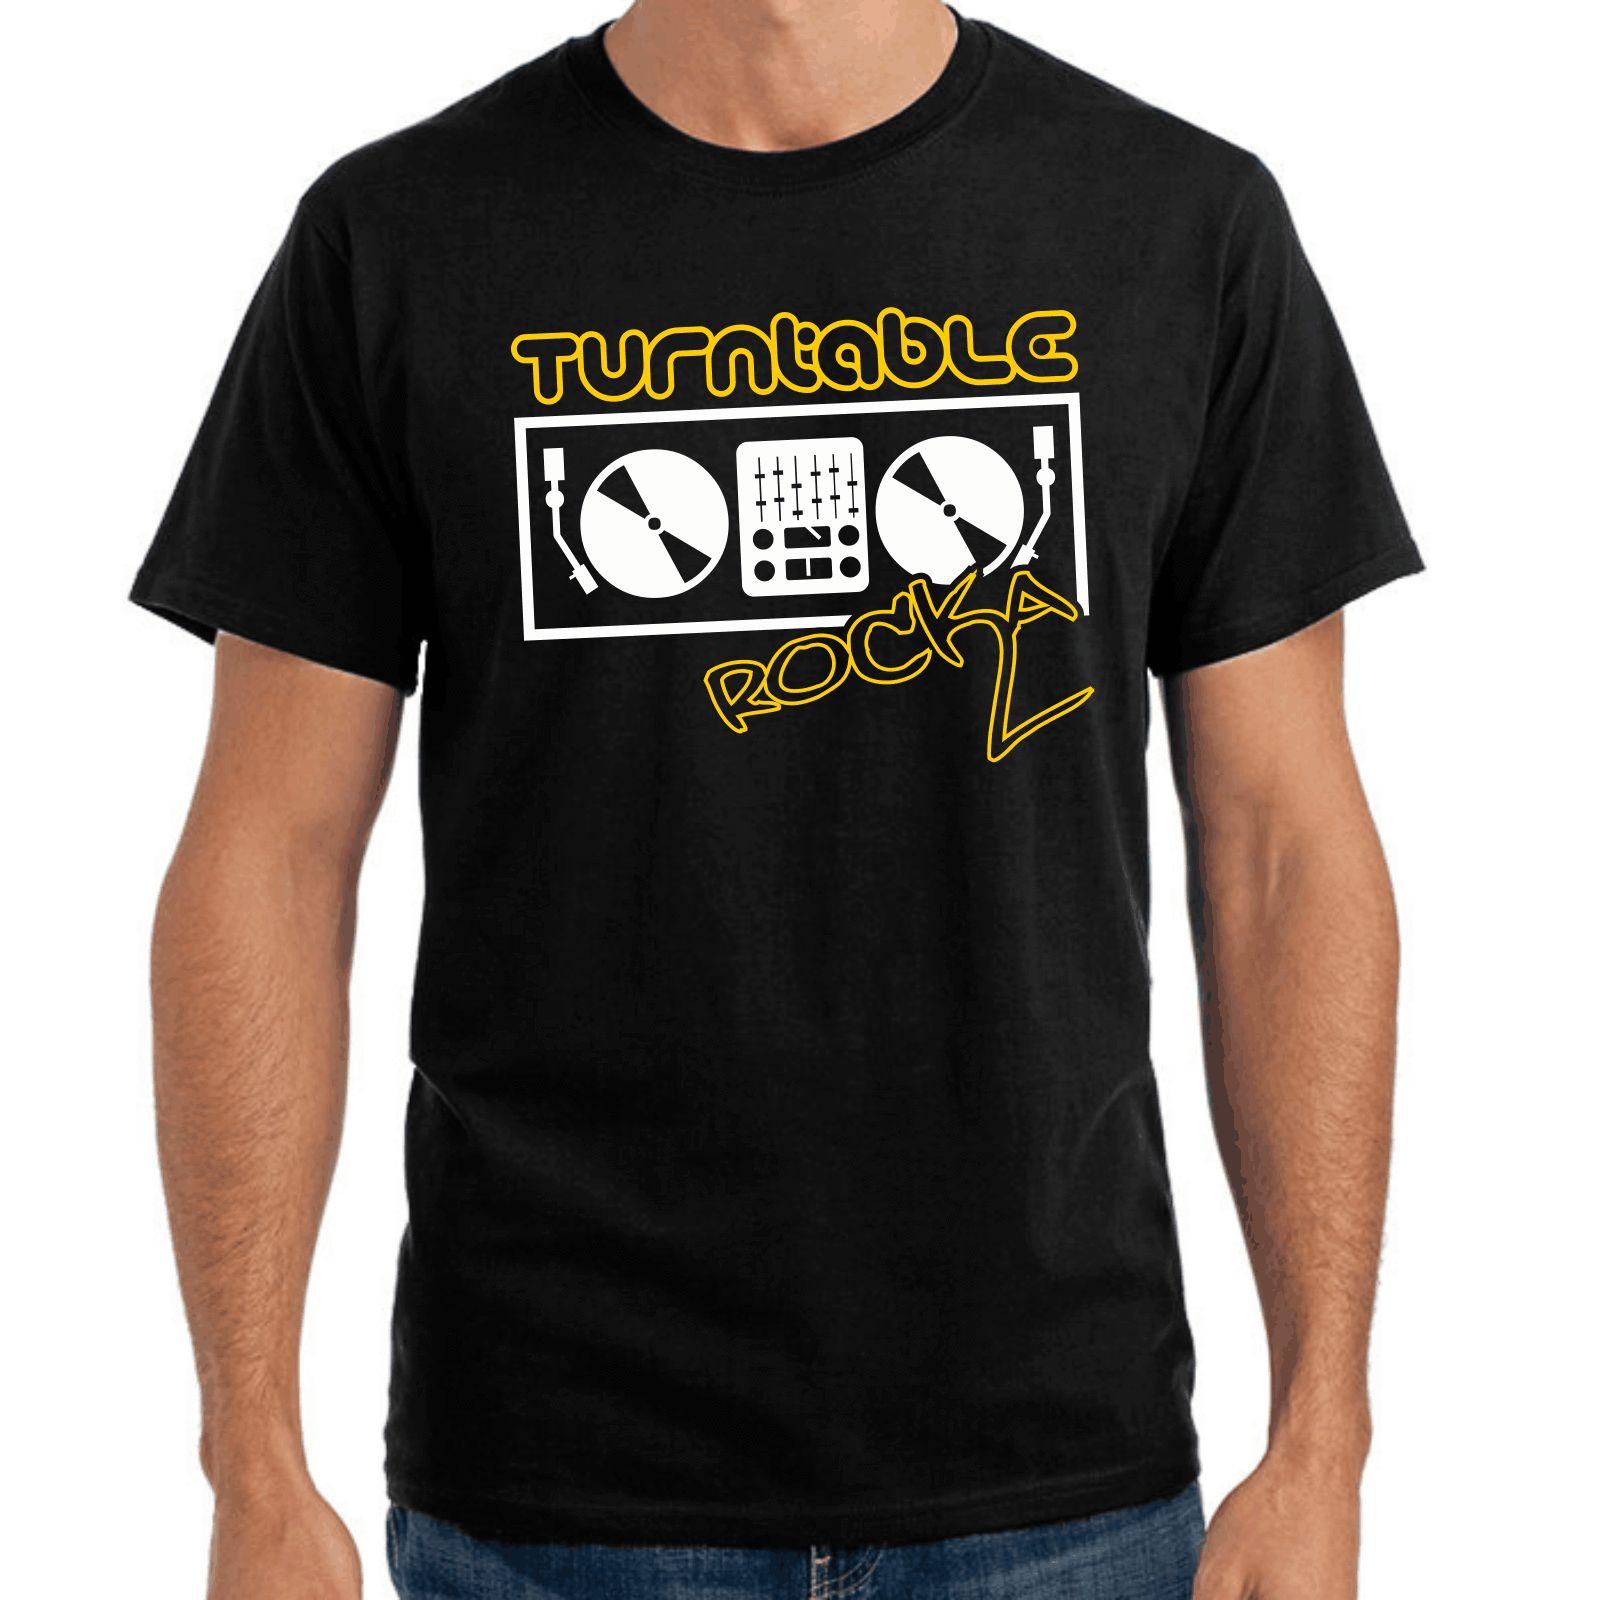 Turntable Rocka Rocker Vinyl Dj Oldschool Music S Xxl T Shirt